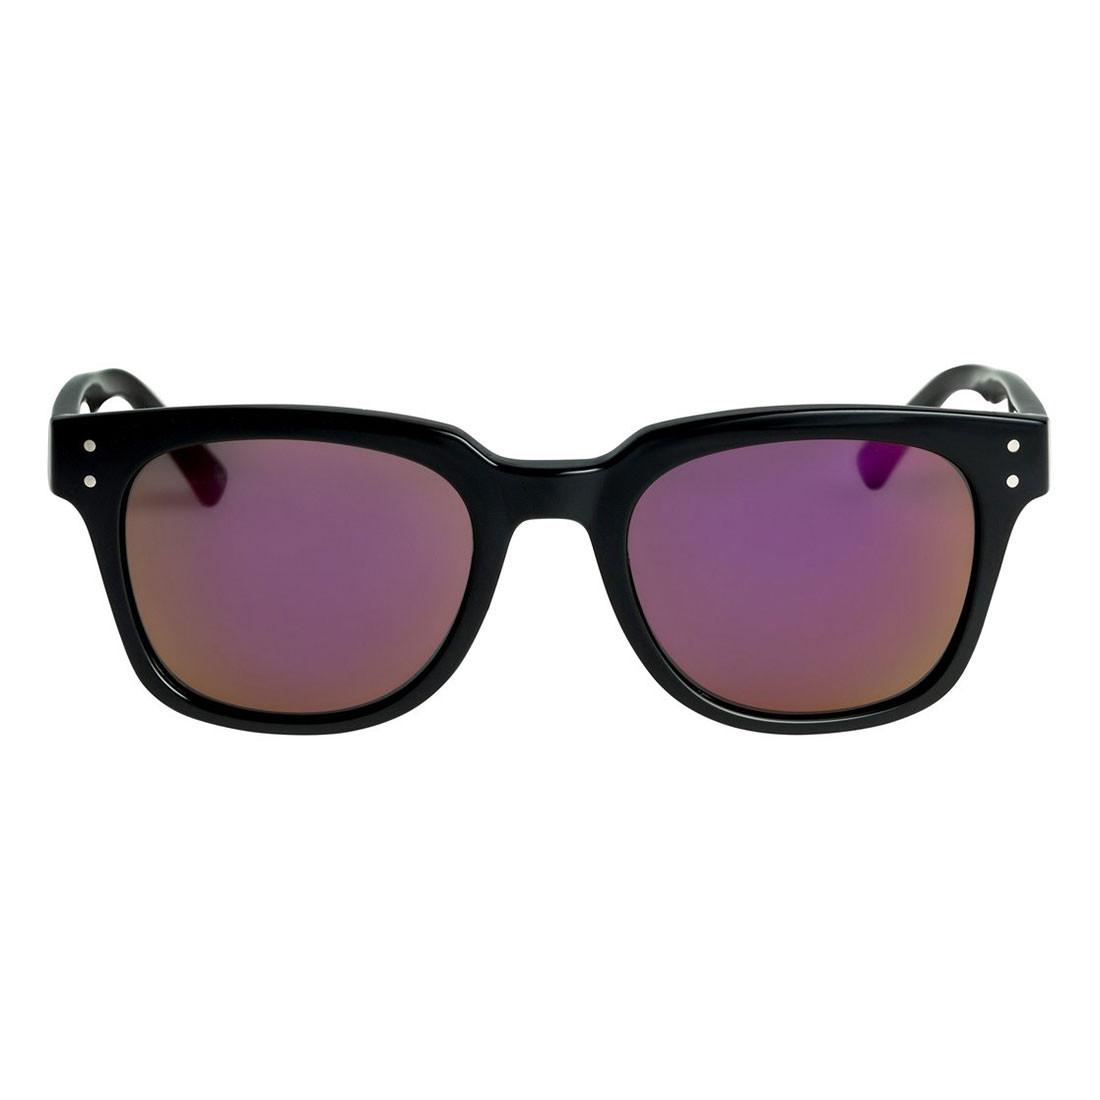 b35c1381e Slnečné okuliare Roxy Rita shiny black | Snowboard Zezula